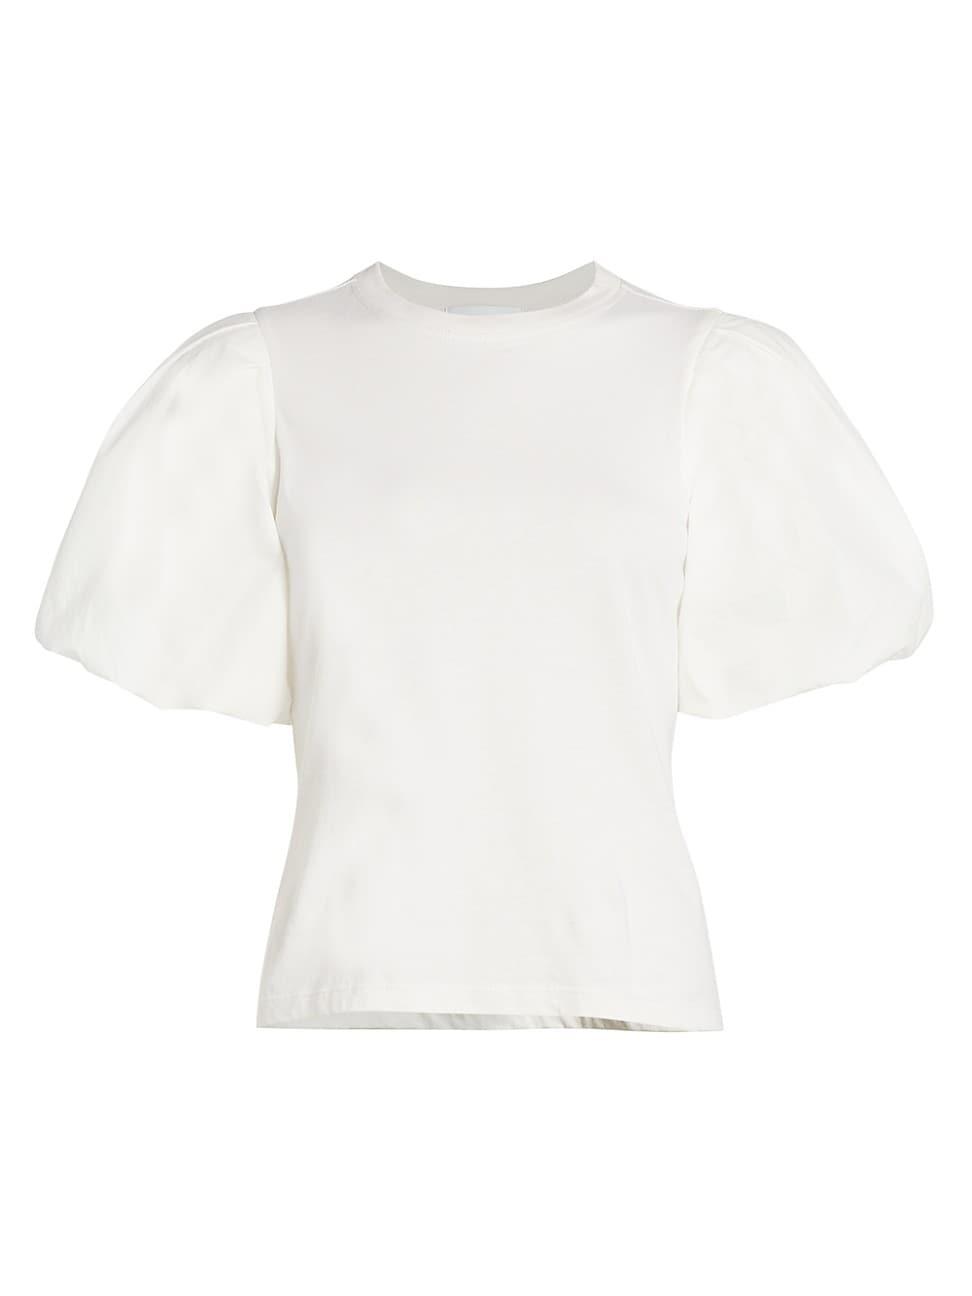 Jonathan Simkhai Standard WOMEN'S DENISE COMBO PUFF-SLEEVE TOP